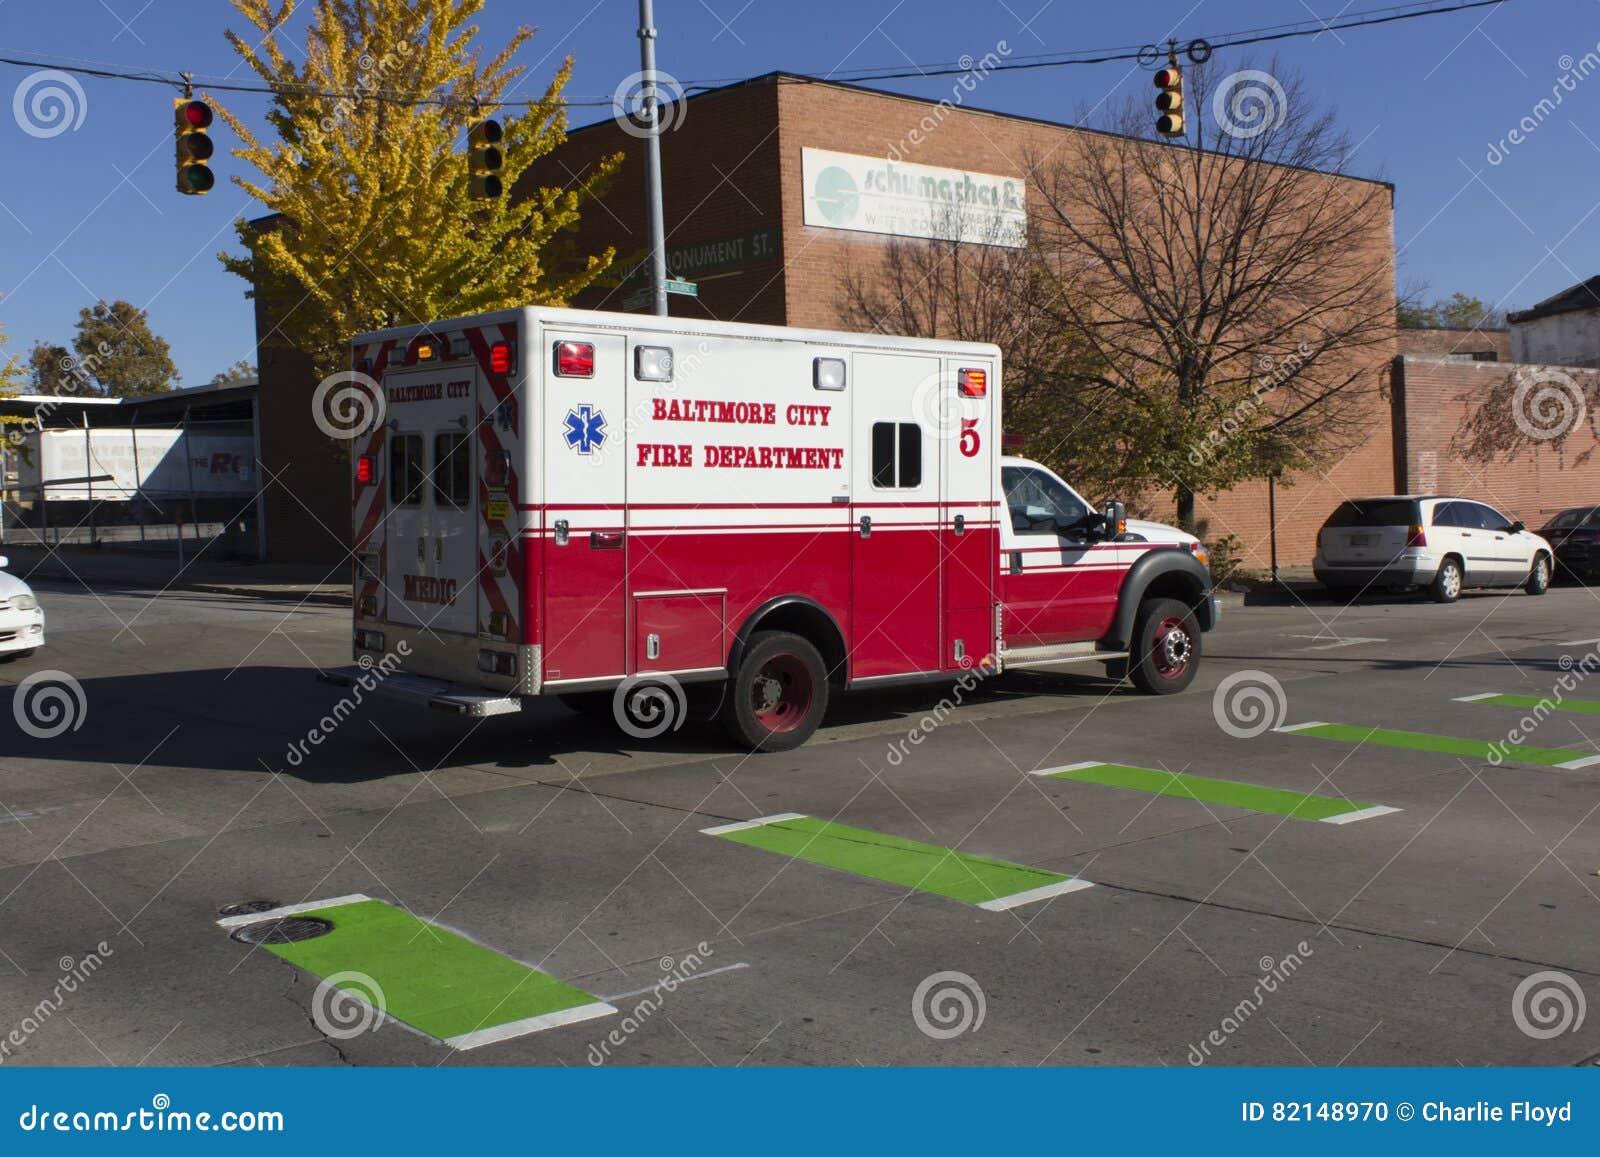 Baltimore FD ambulance on a call